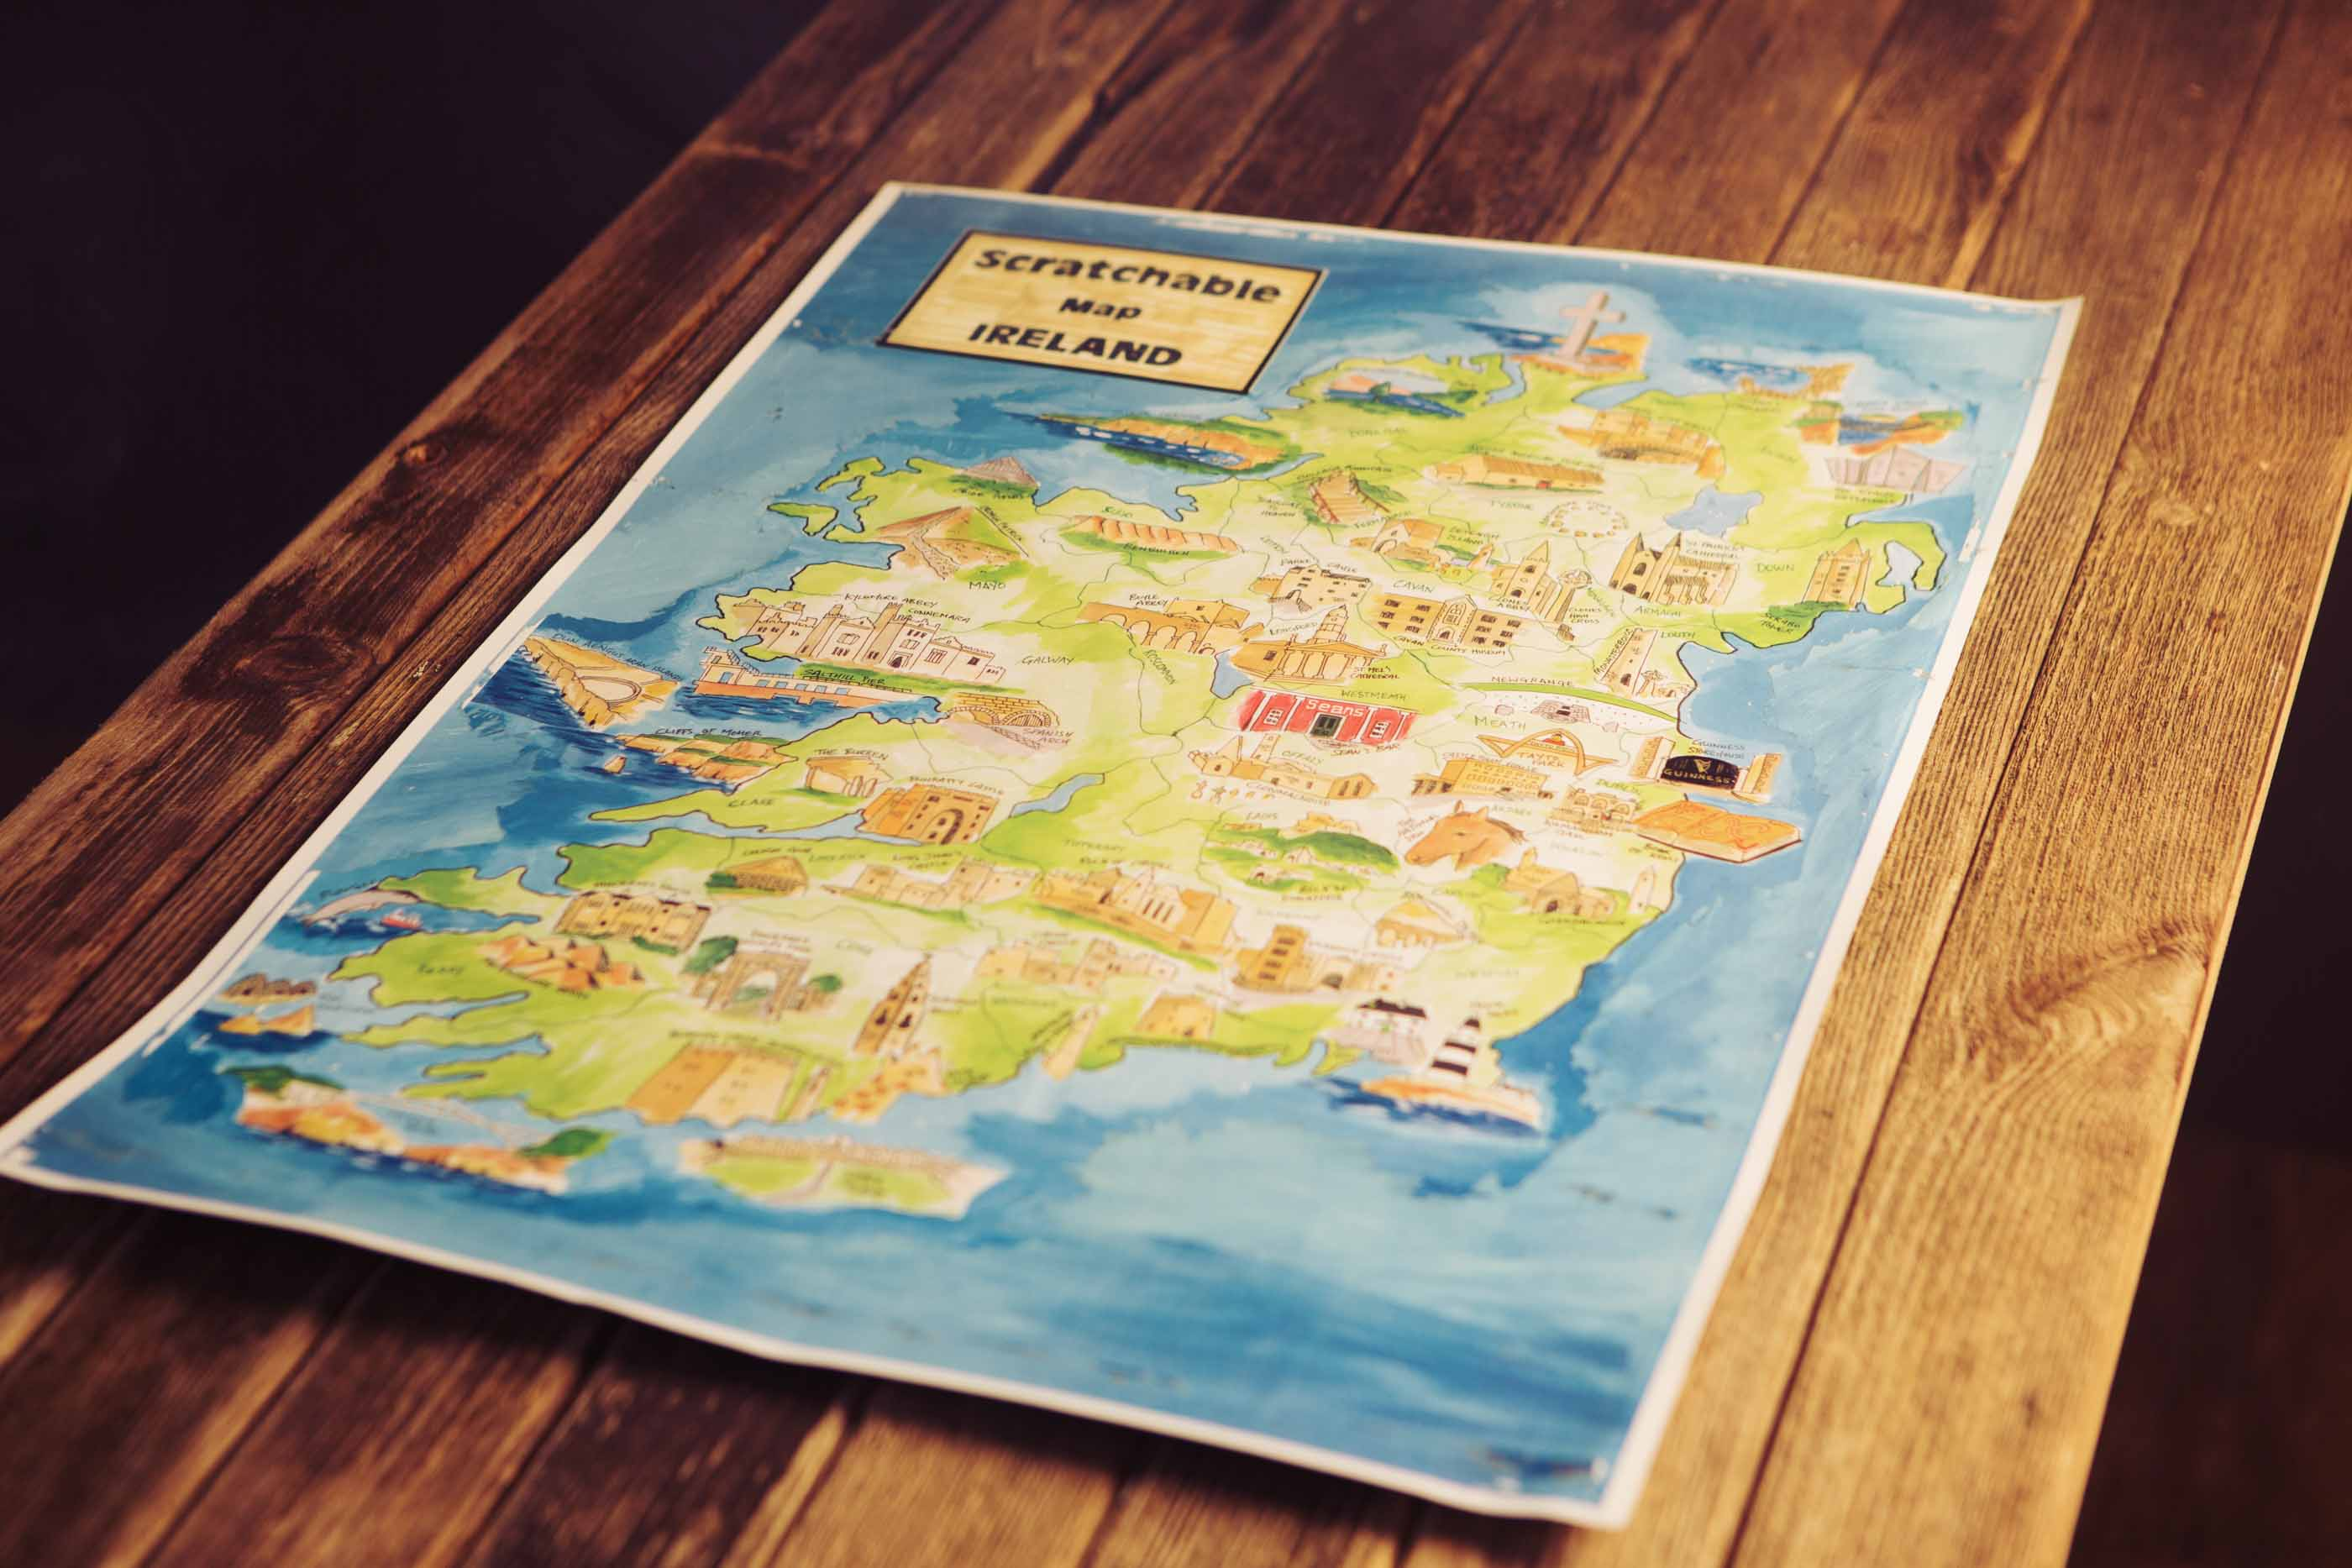 Scratchable Map